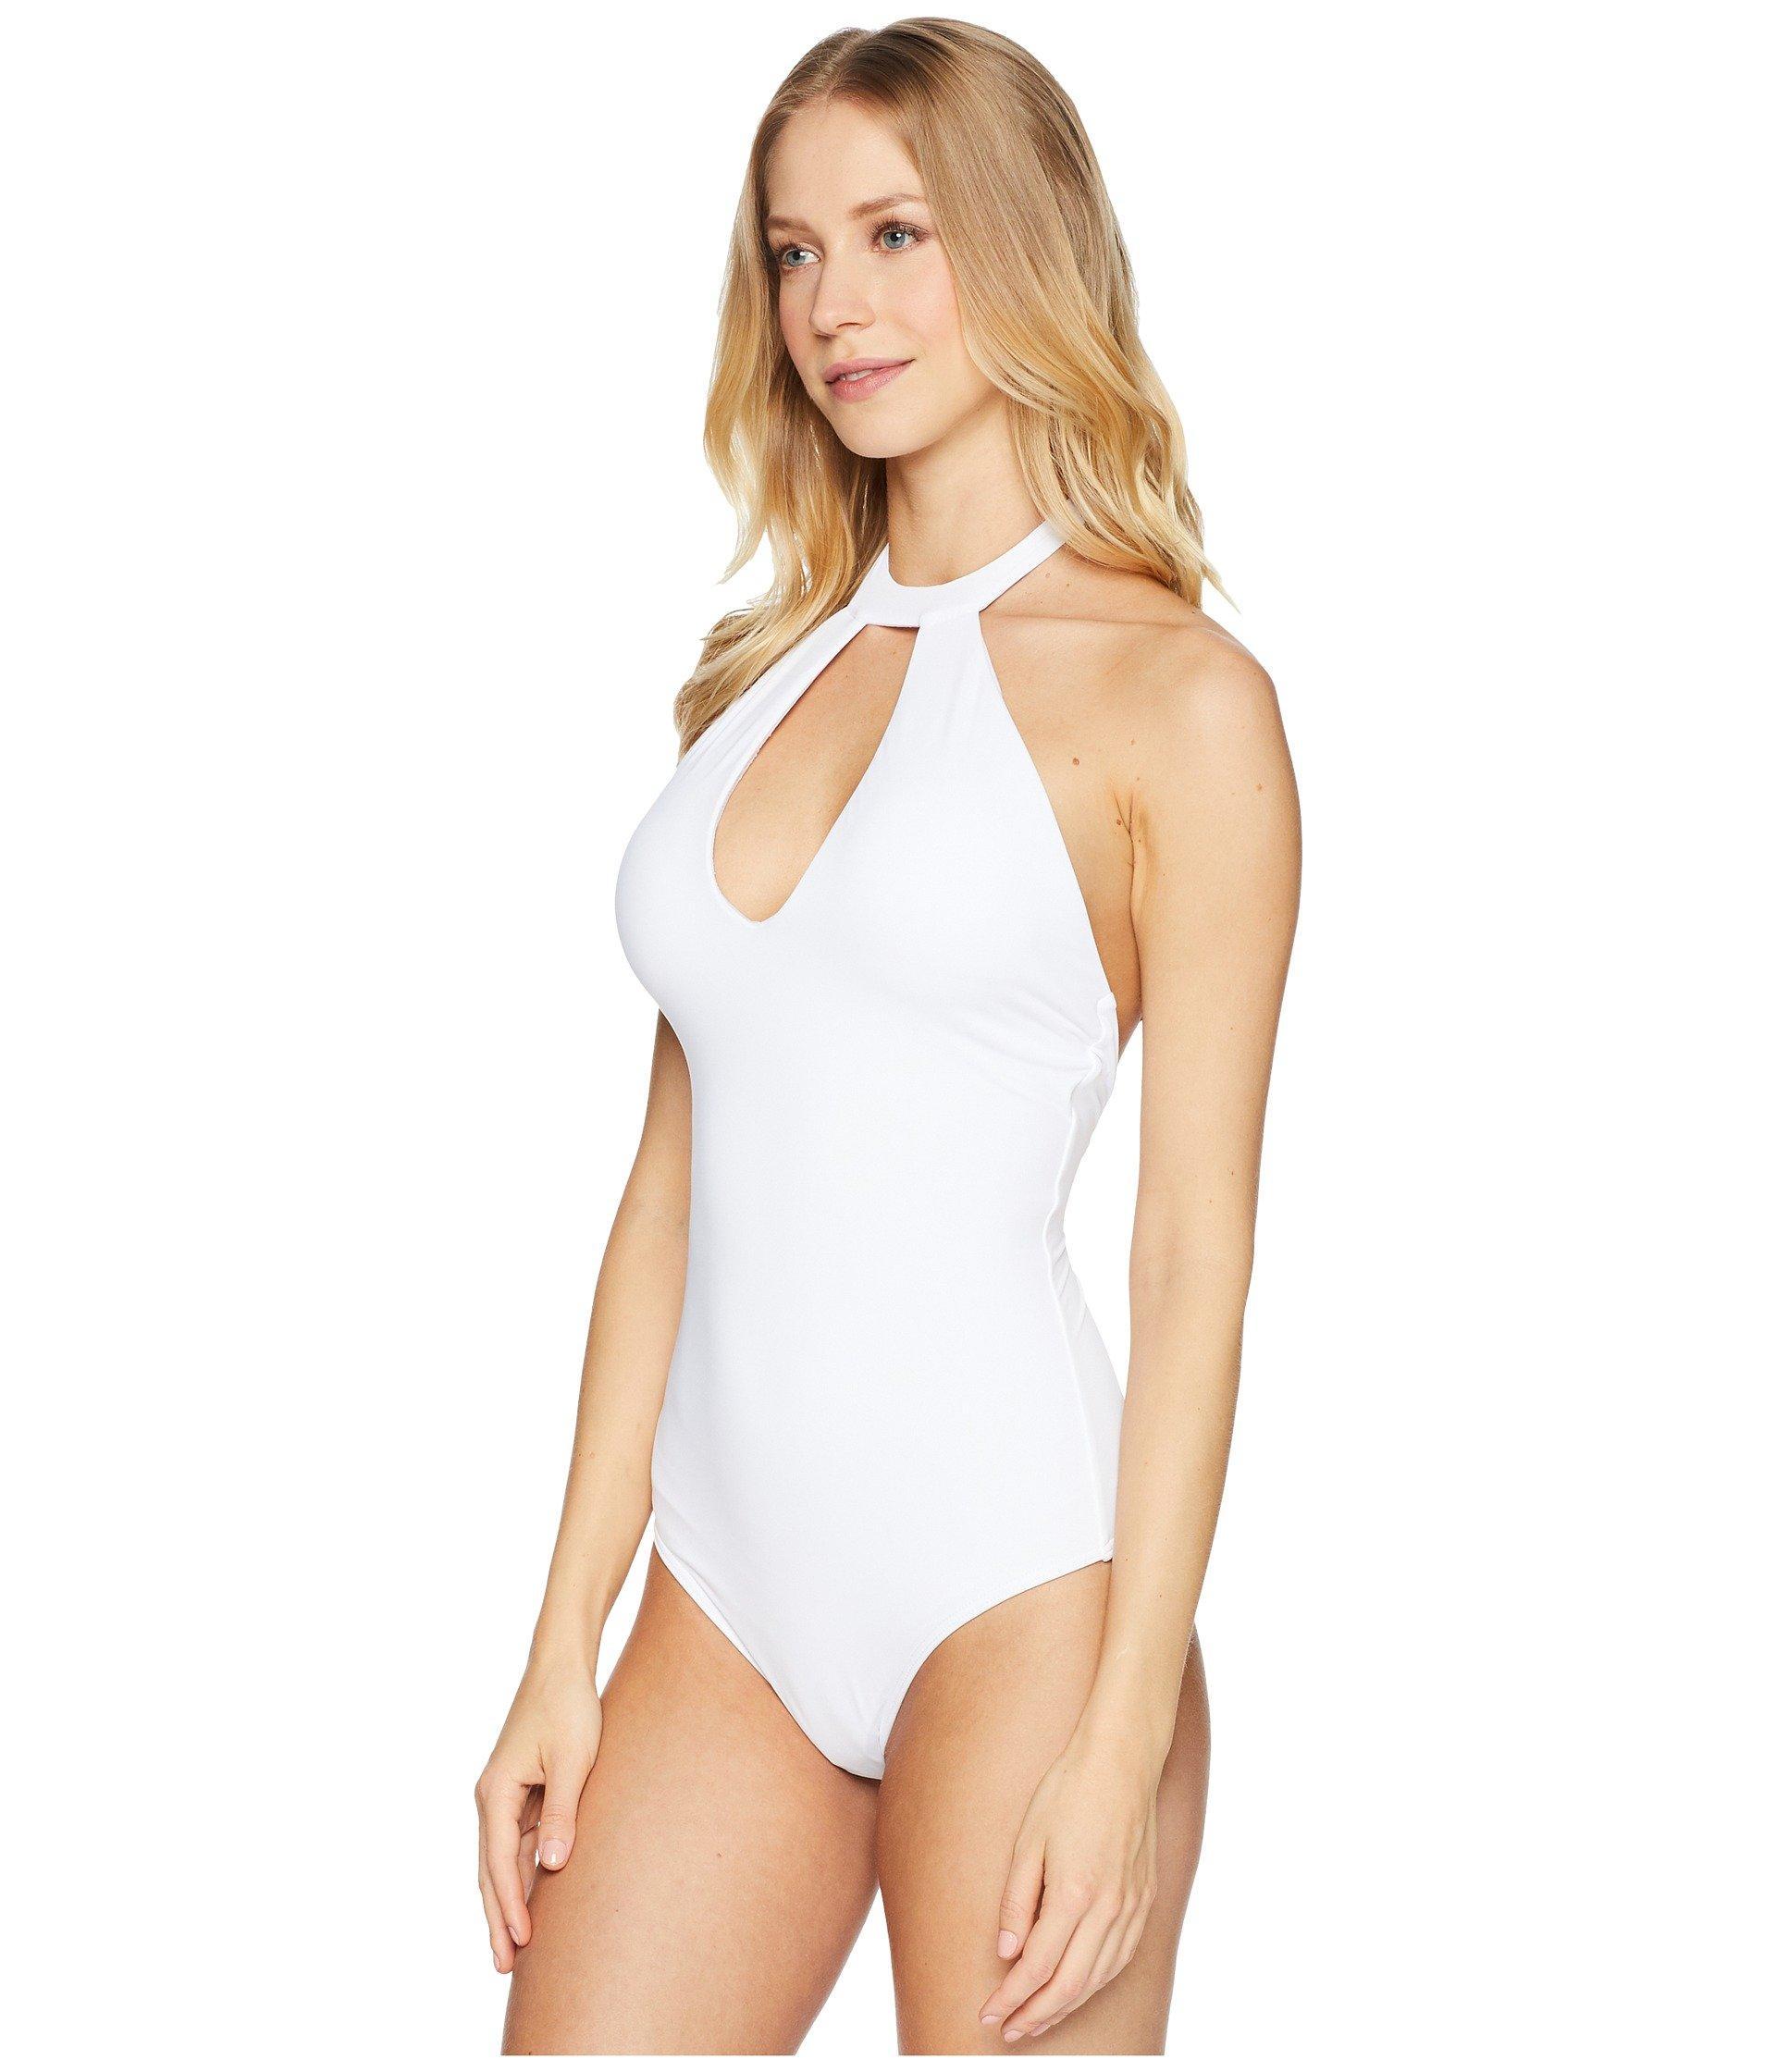 2ef6d887a66b0 Lyst - O'neill Sportswear Salt Water Solids Hi-neck One-piece in White -  Save 15%